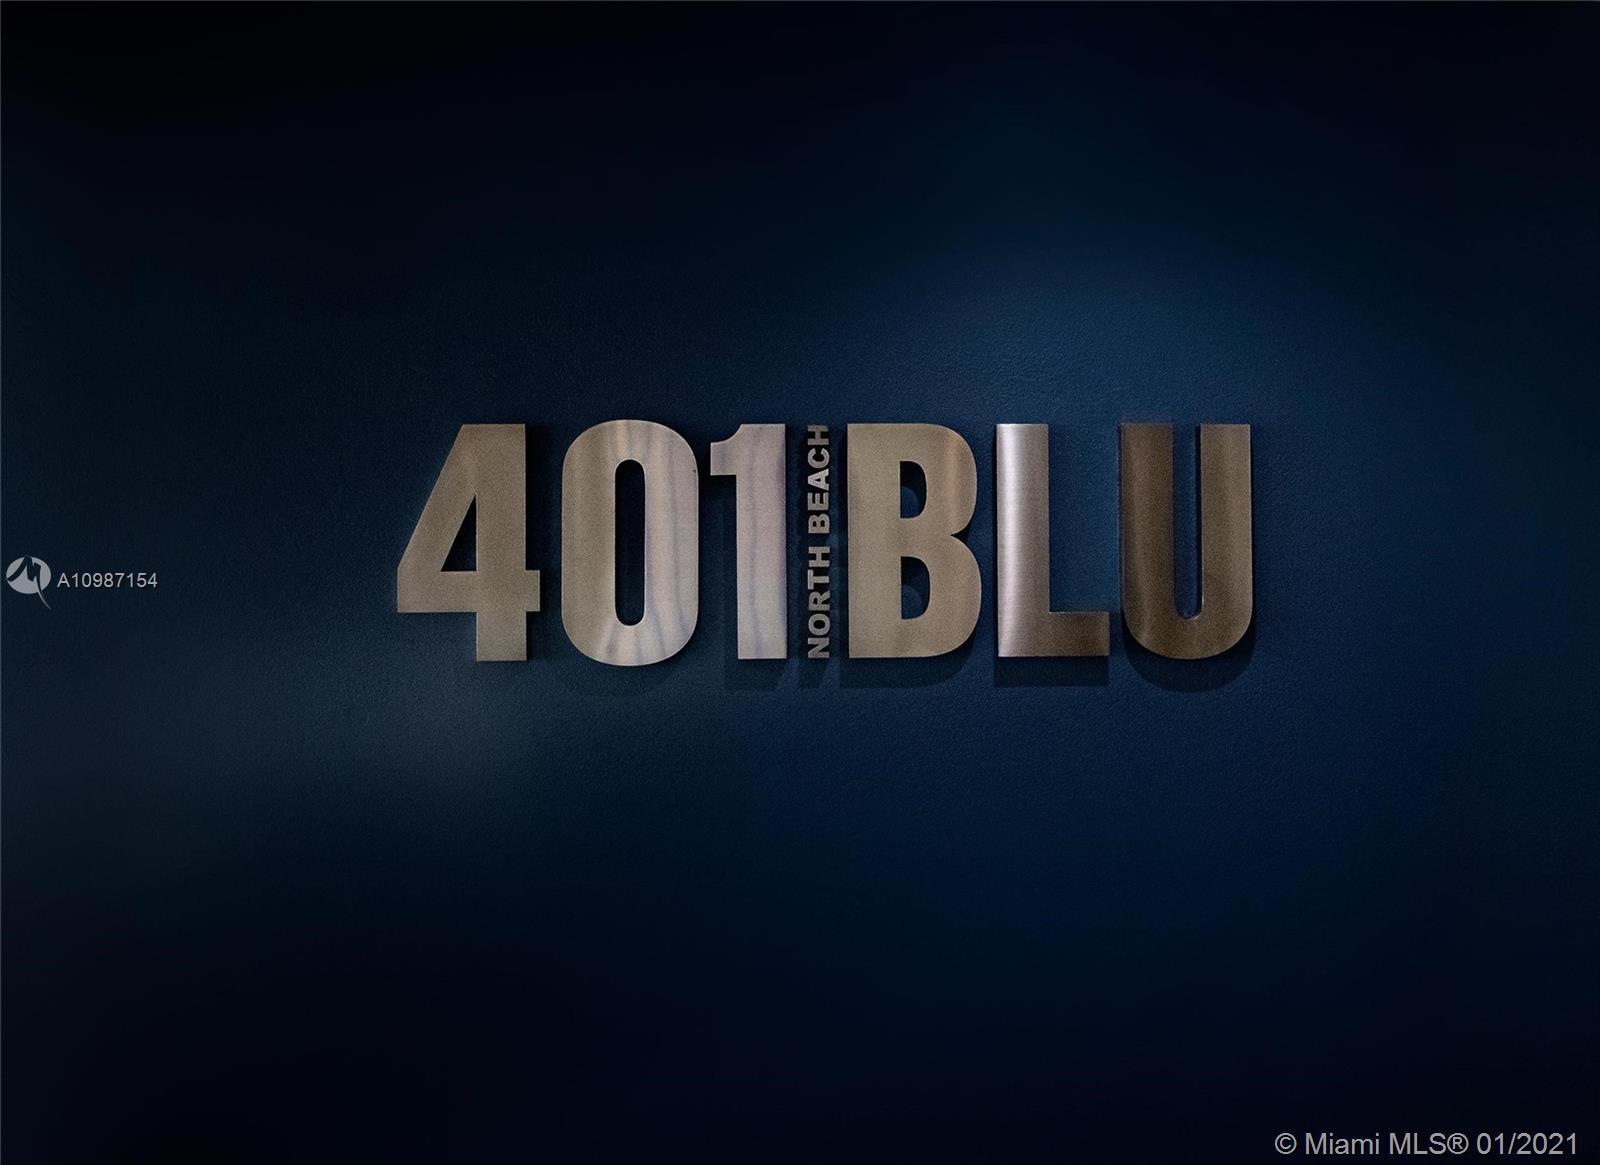 SPACIOUS 1/1 IN THE HEART OF MIAMI BEACH AT 401 BLUE CONDOMINIUM. 2 BLOCKS FROM OCEAN. 1 BLOCK FROM